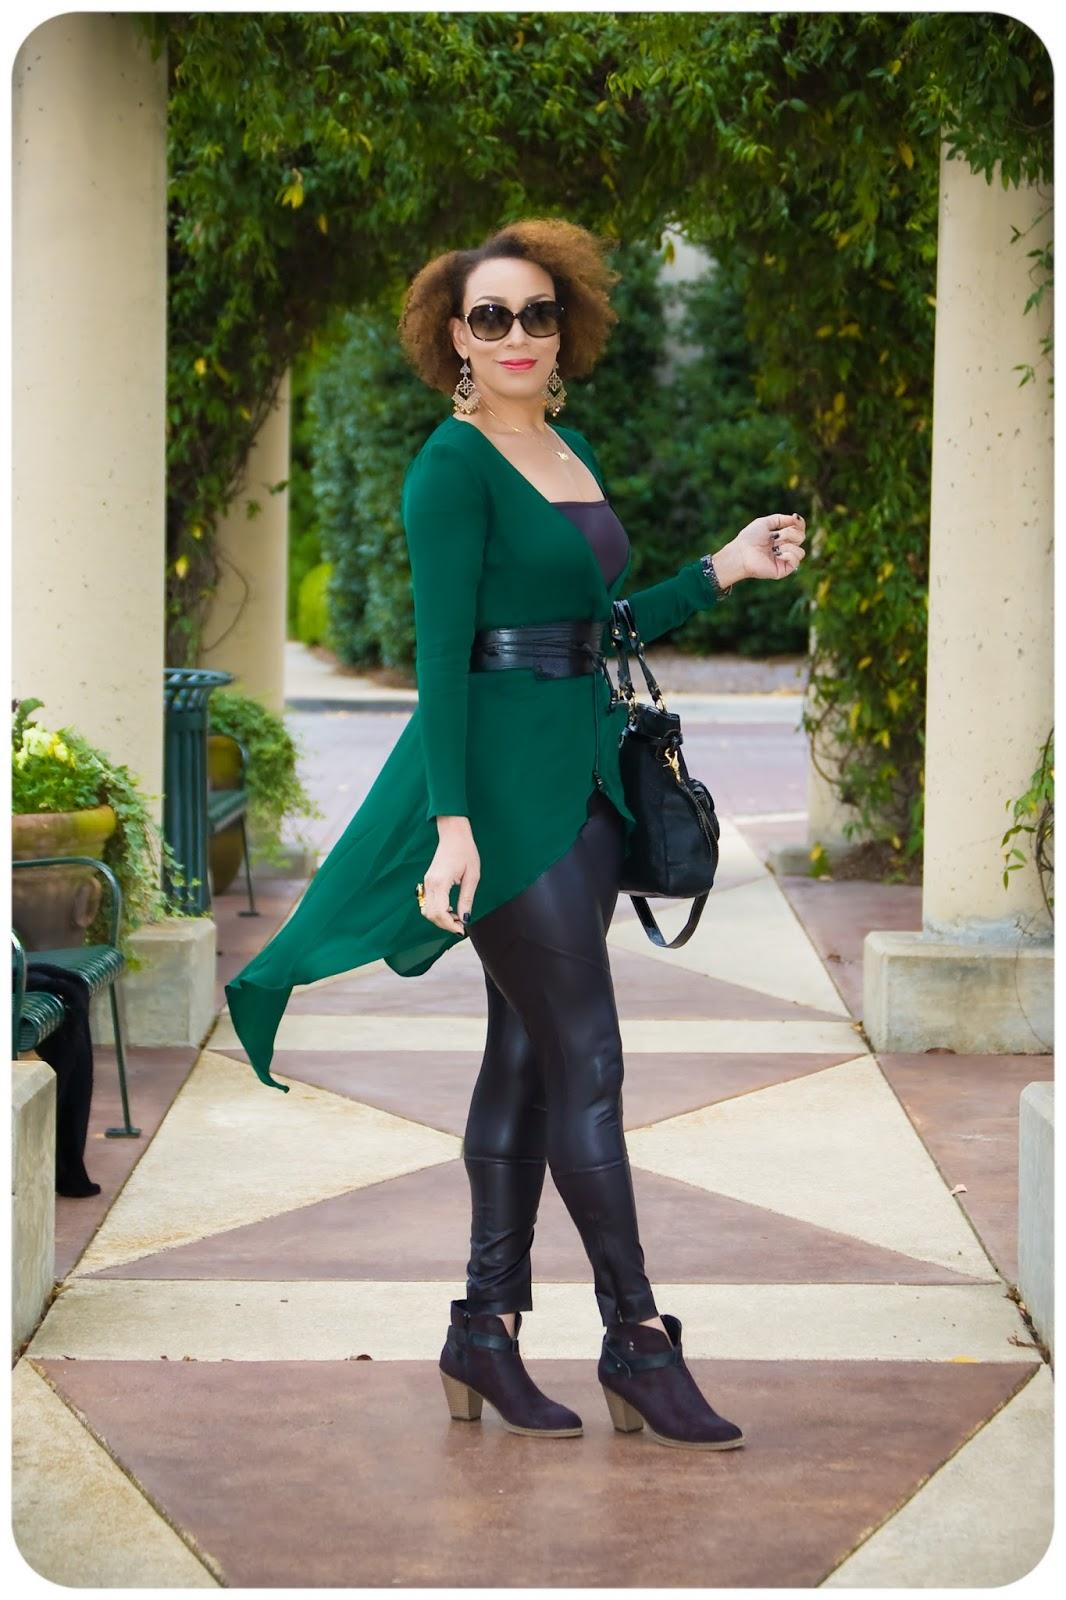 4 Ways To Be More Stylish & Fashionable - Leggings - Erica Bunker DIY Style